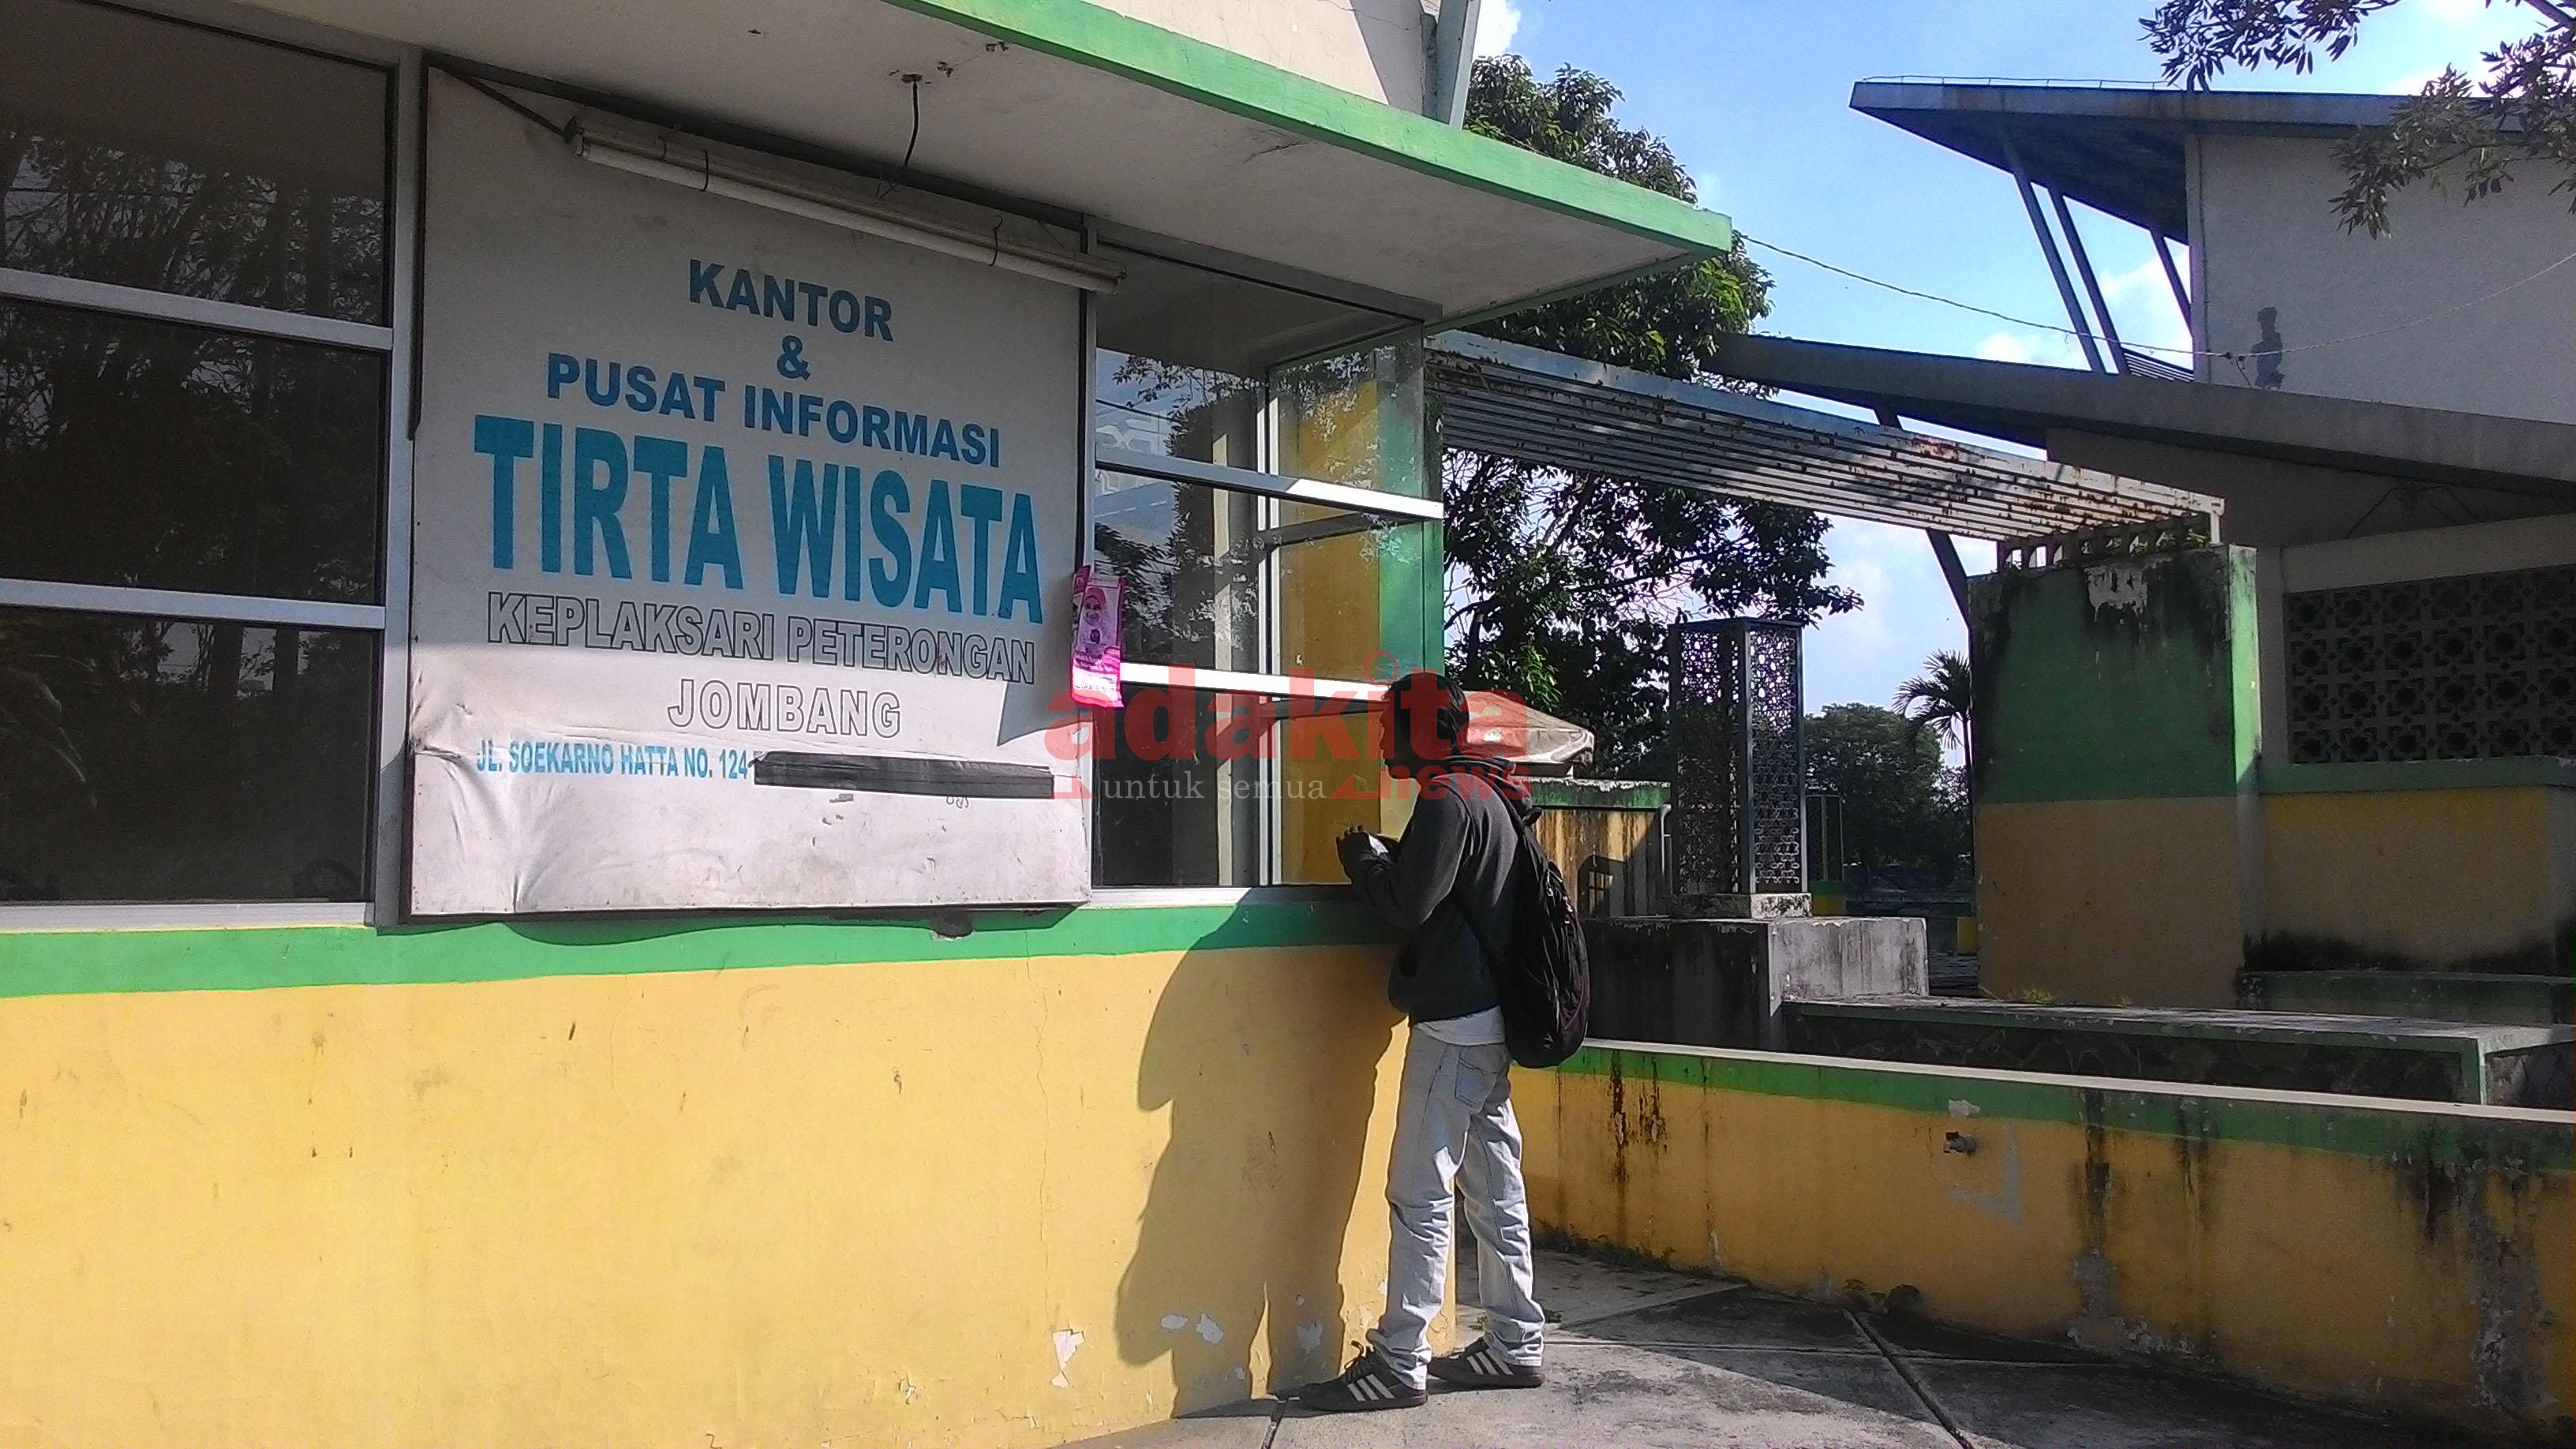 Disbudpar Kabupaten Jombang Upayakan Pembangunan Tirta Wisata Adakitanews Tempat Taman